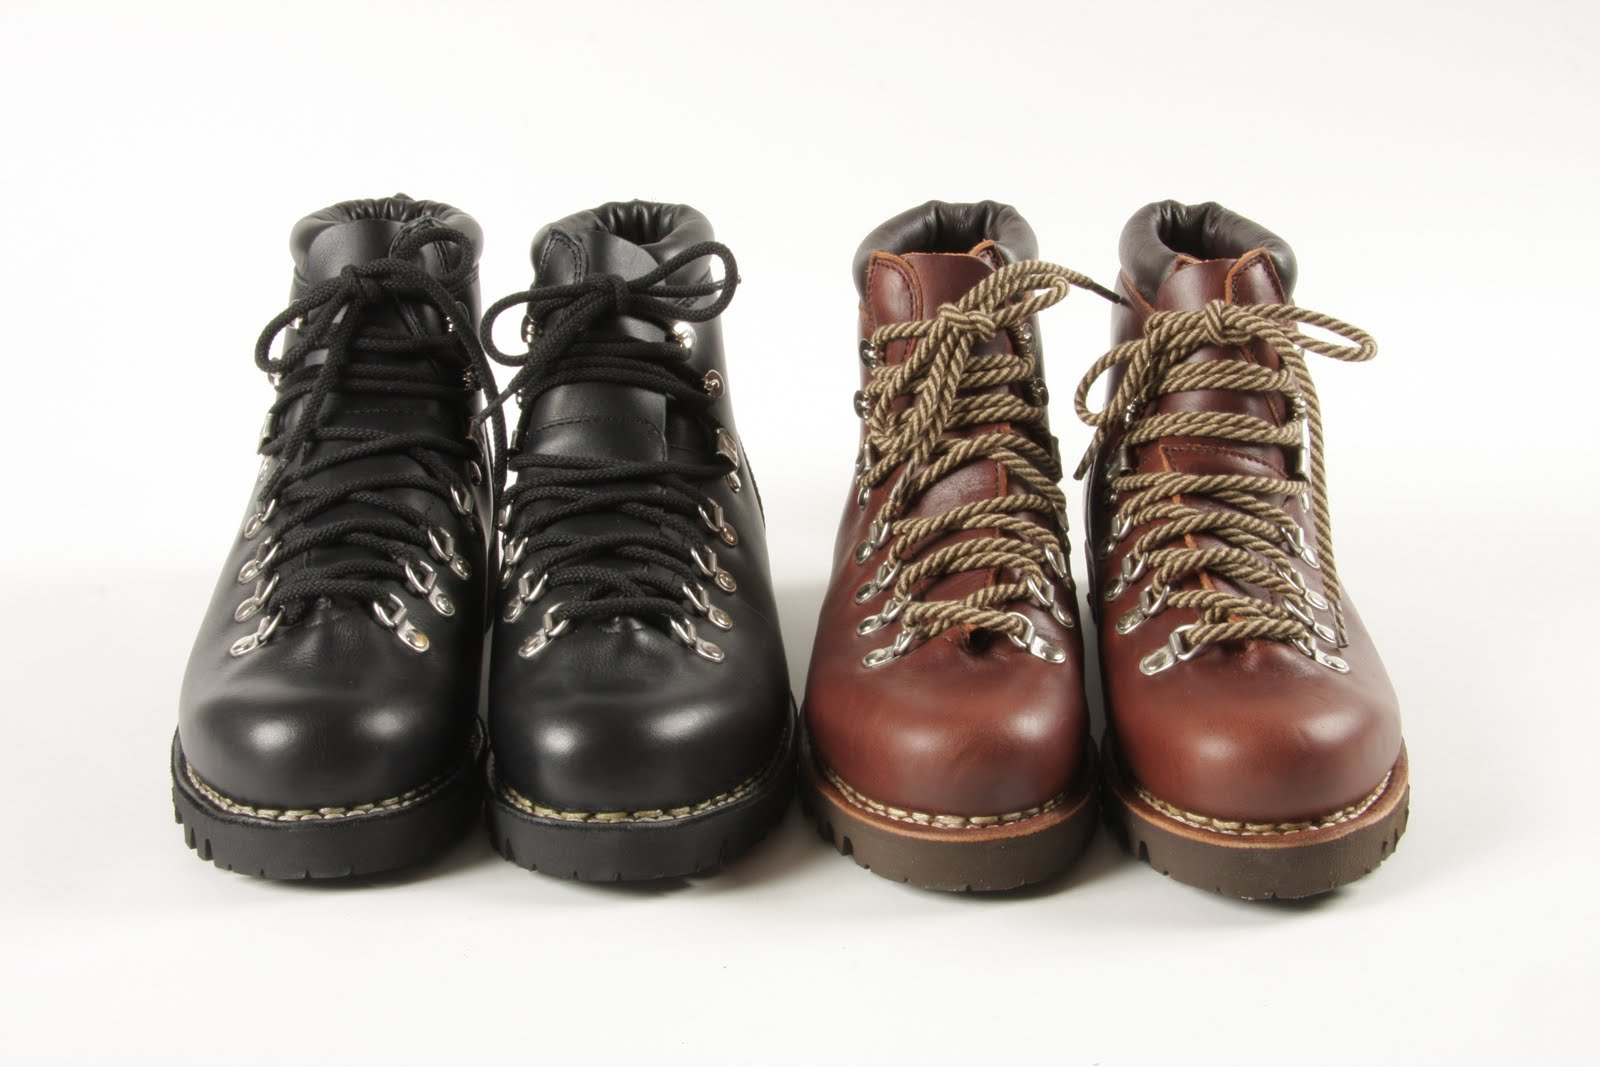 8f53364a076 Ronnie Fieg's Fashion Hikers – The Shoe Snob Blog